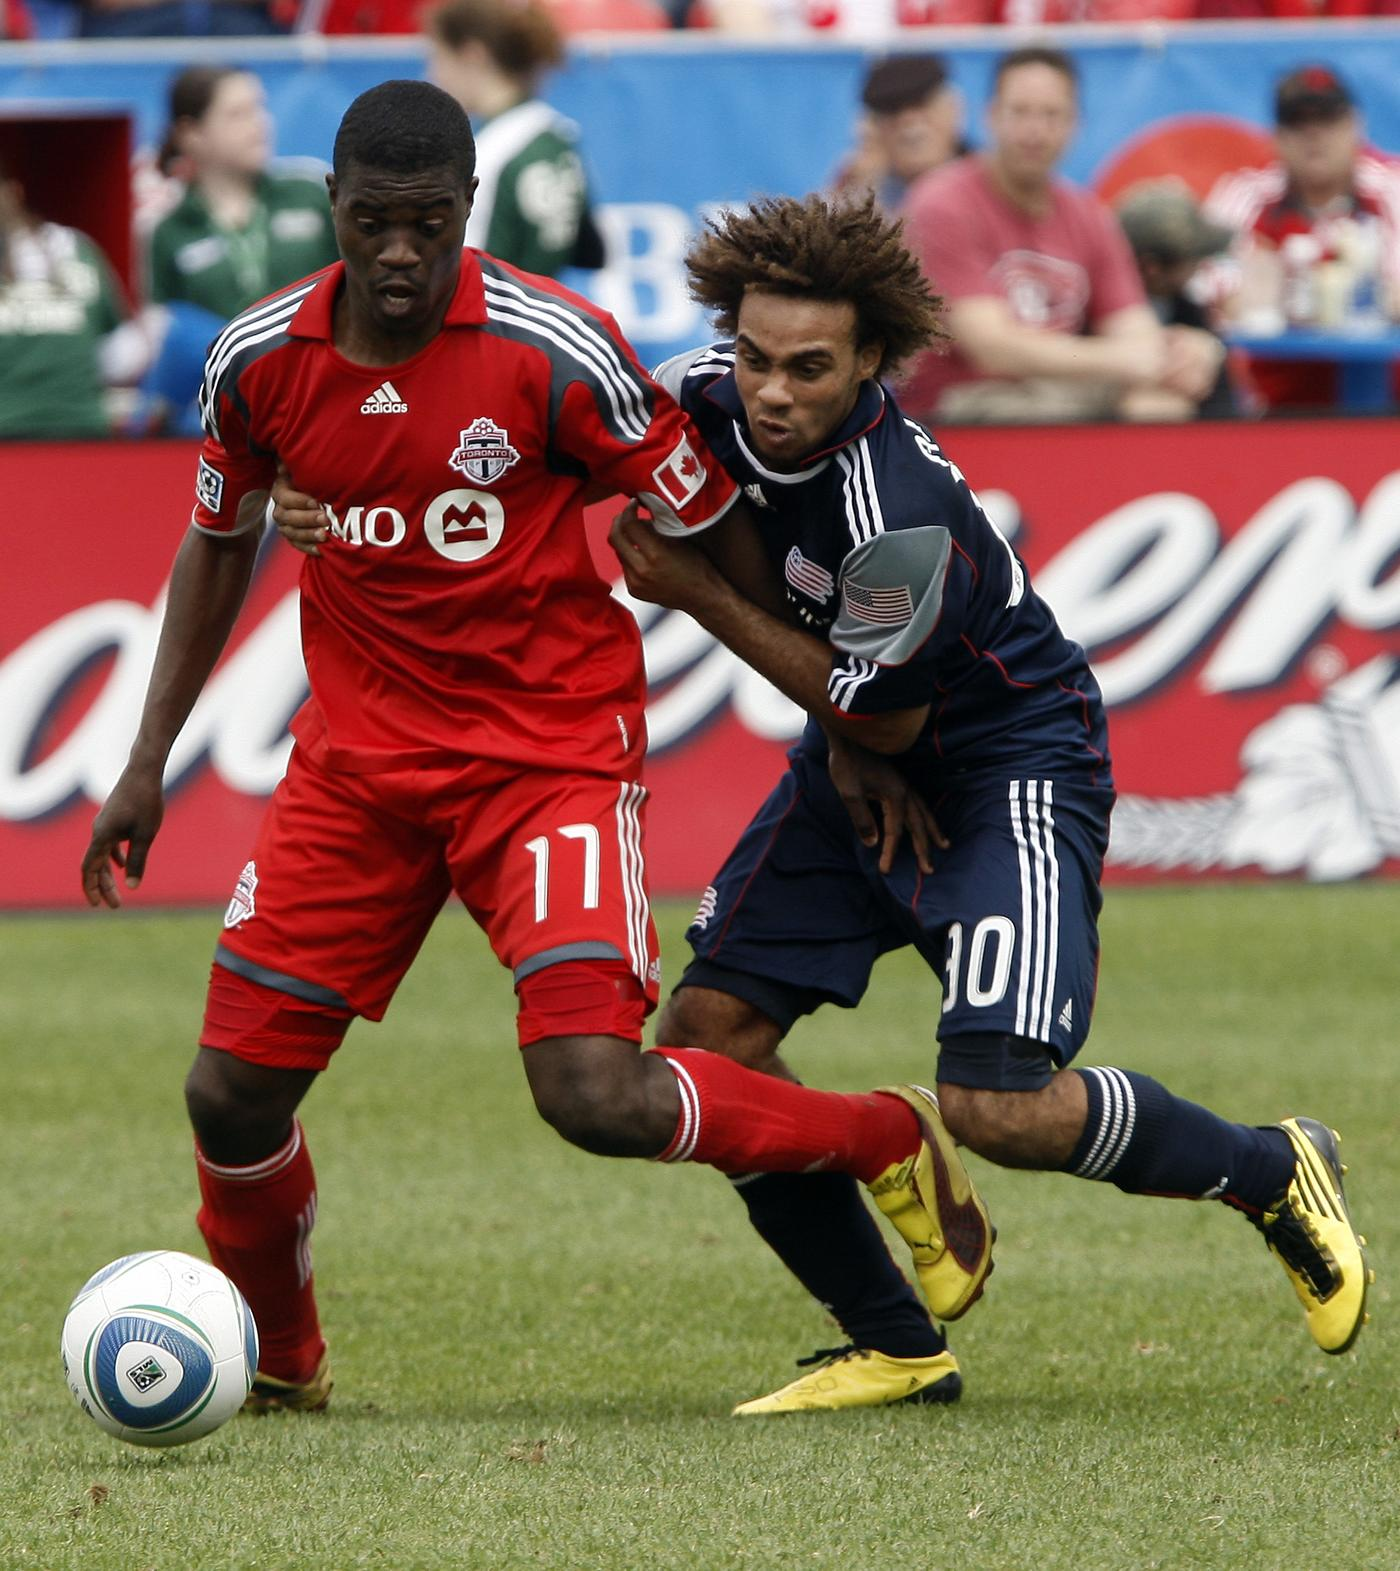 Toronto FC 1, Revolution 0